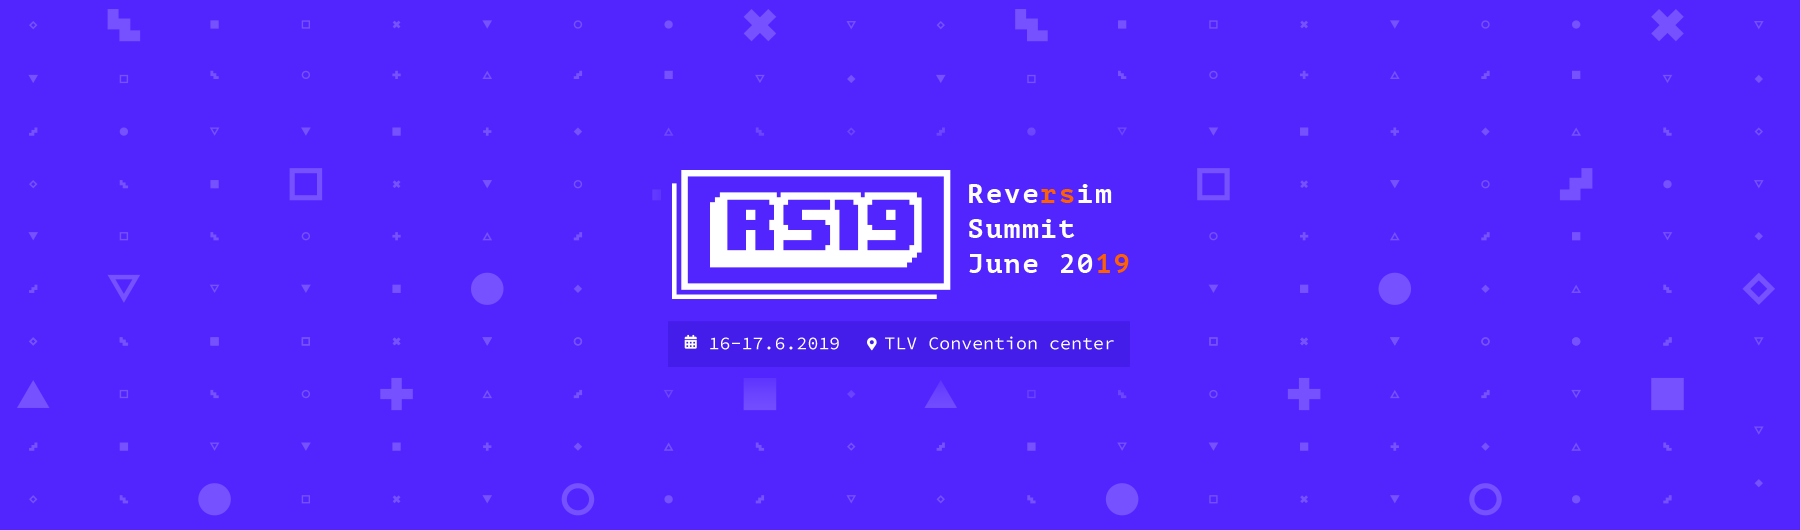 Reversim Summit 2019